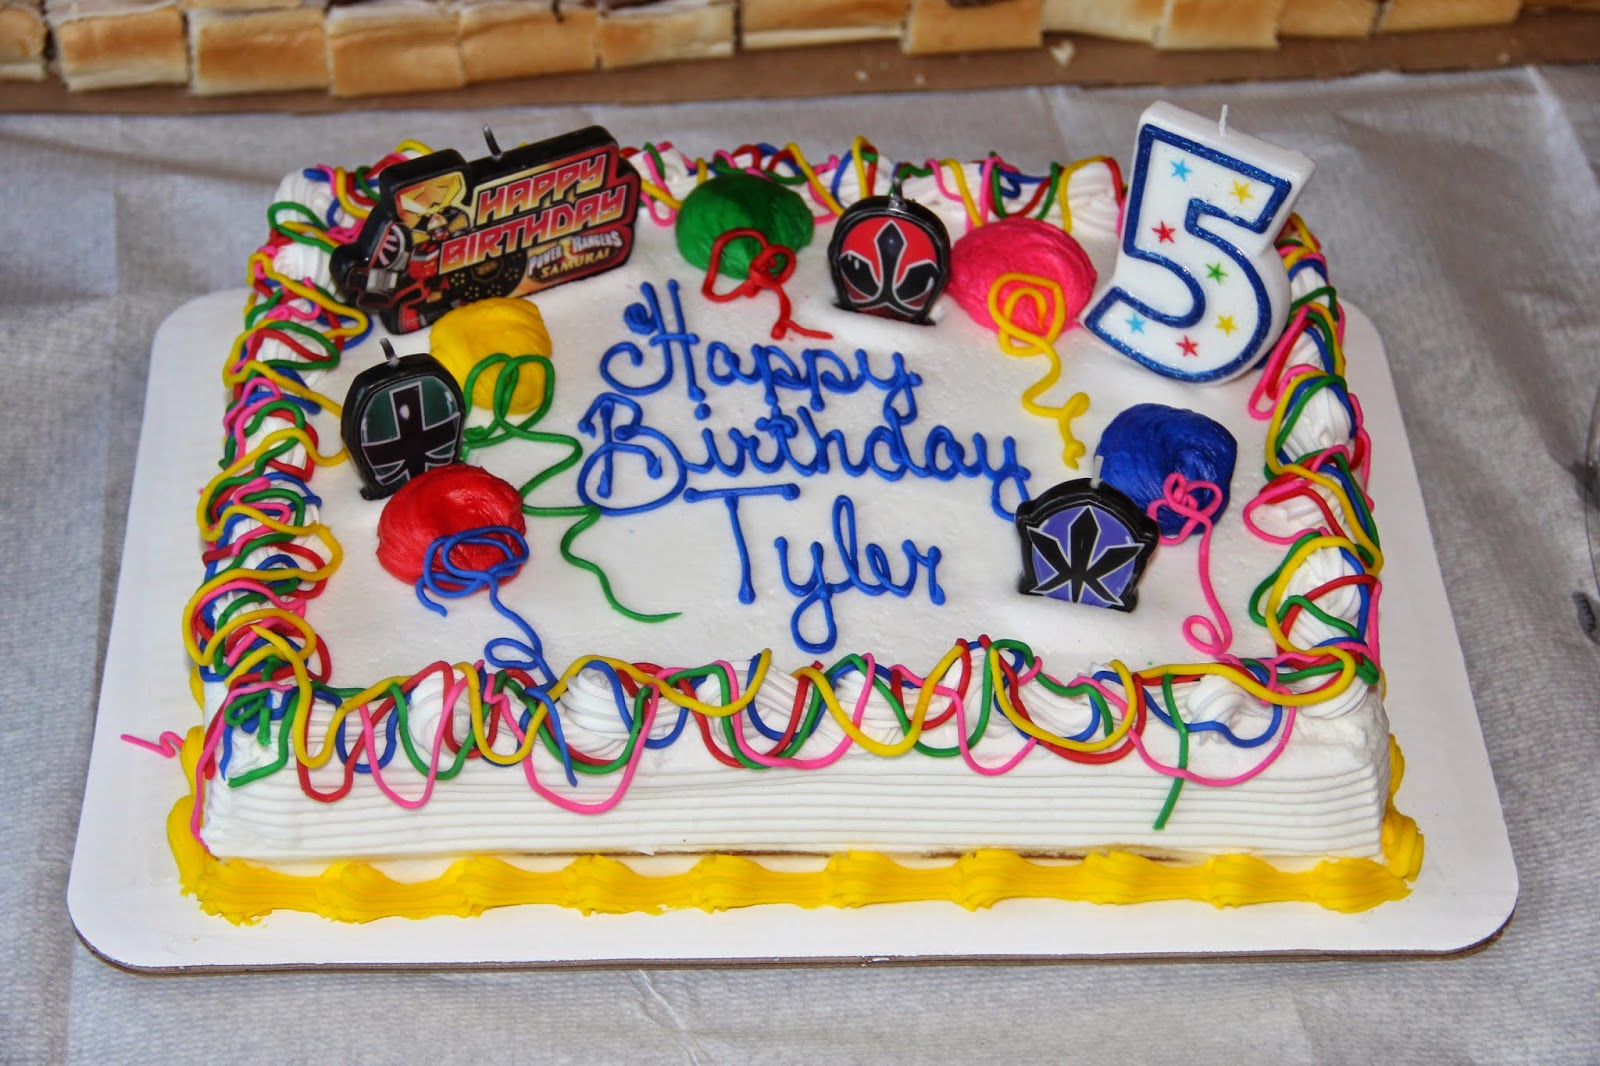 Francis Family Fun Tylers 5th Birthday